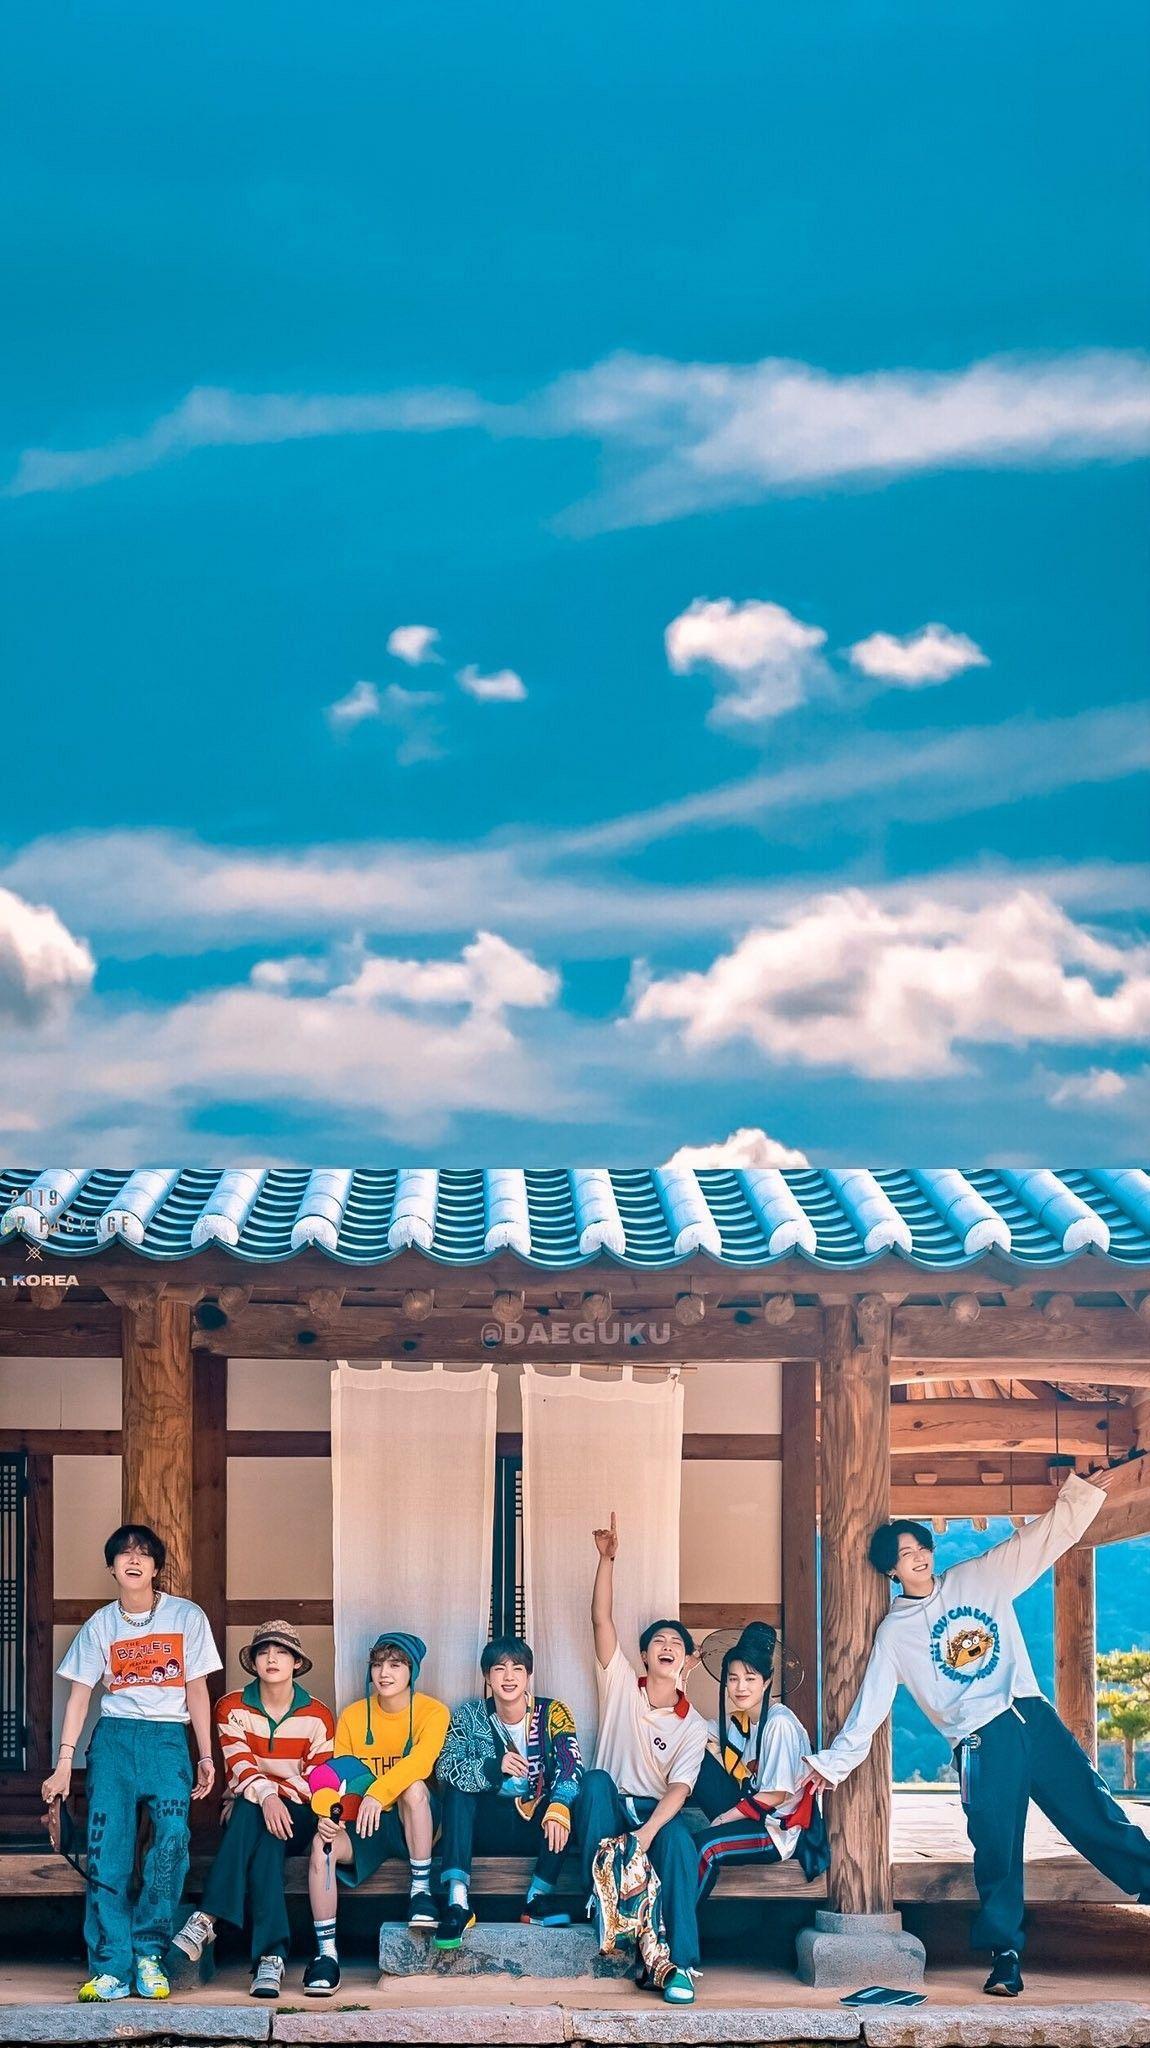 Bts Summer Package In Korea Btssummerpackage2019 Bts Summer Package In Korea Btssummerpackage2019 Bts Sum Wallpaper Bts Pemandangan Khayalan Gambar Fandom Bts summer package wallpaper lockscreen